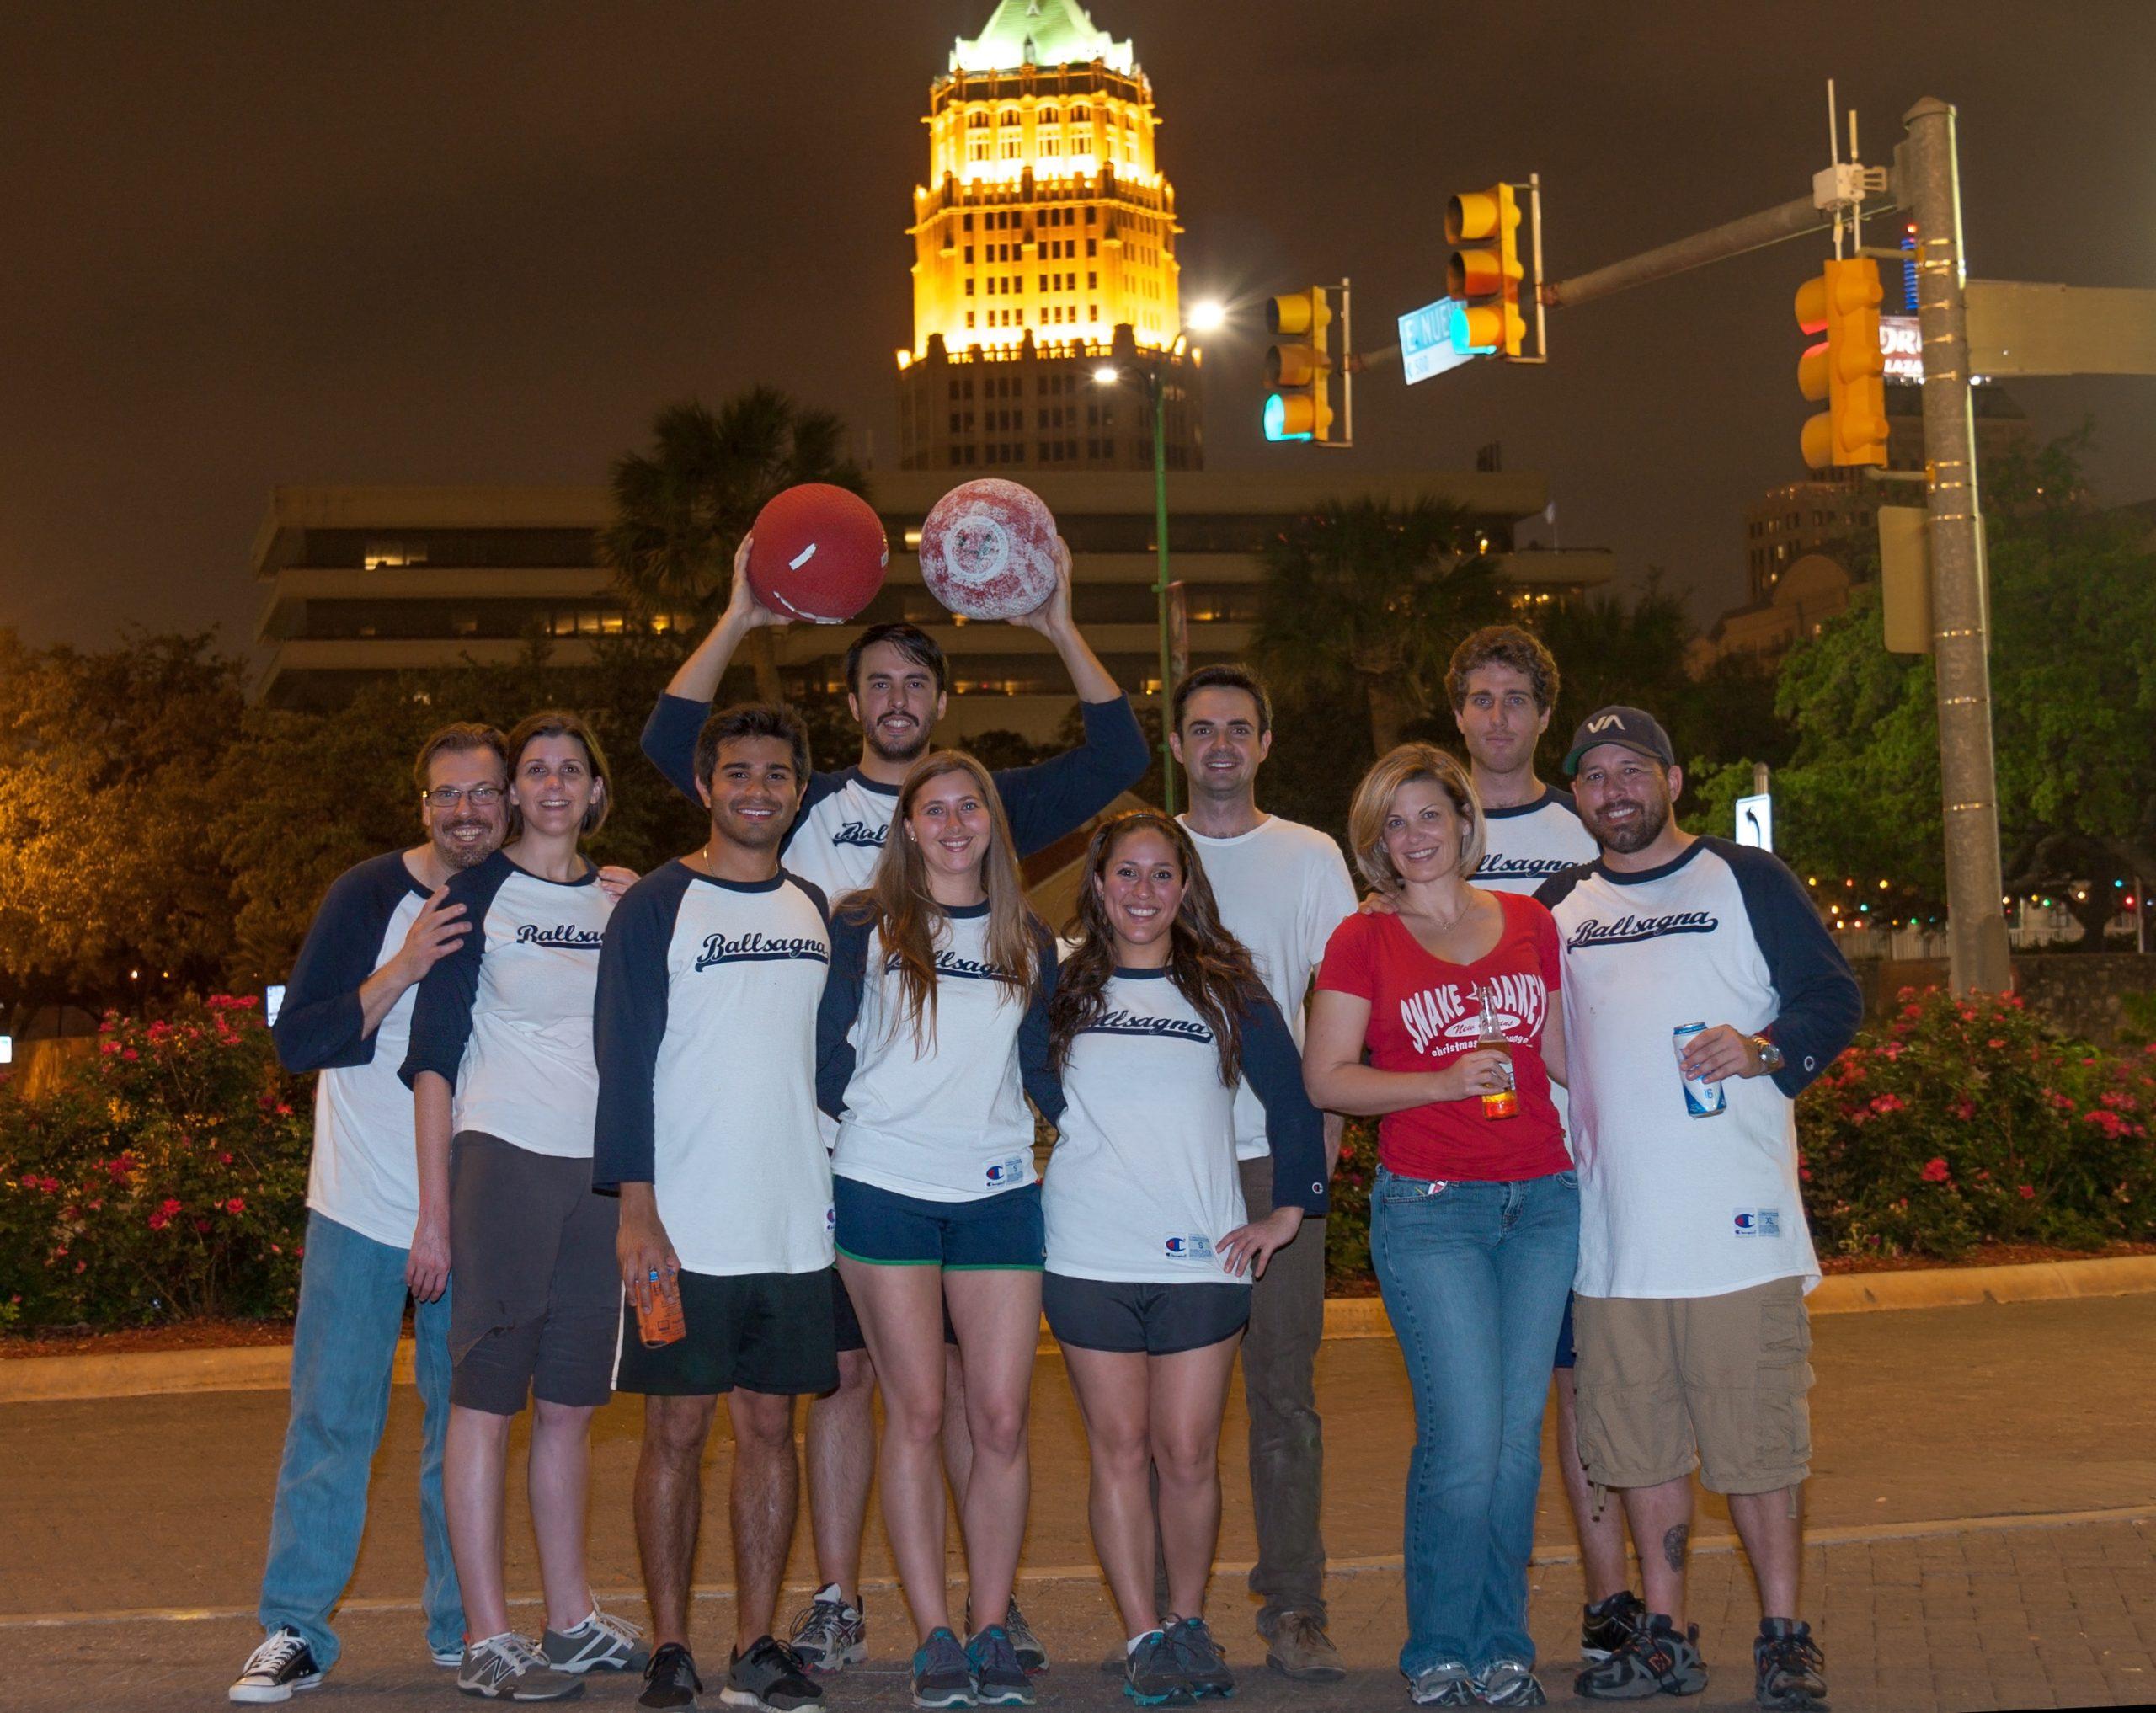 Downtown Kickball, one of many emerging staples of downtown San Antonio. Courtesy photo.